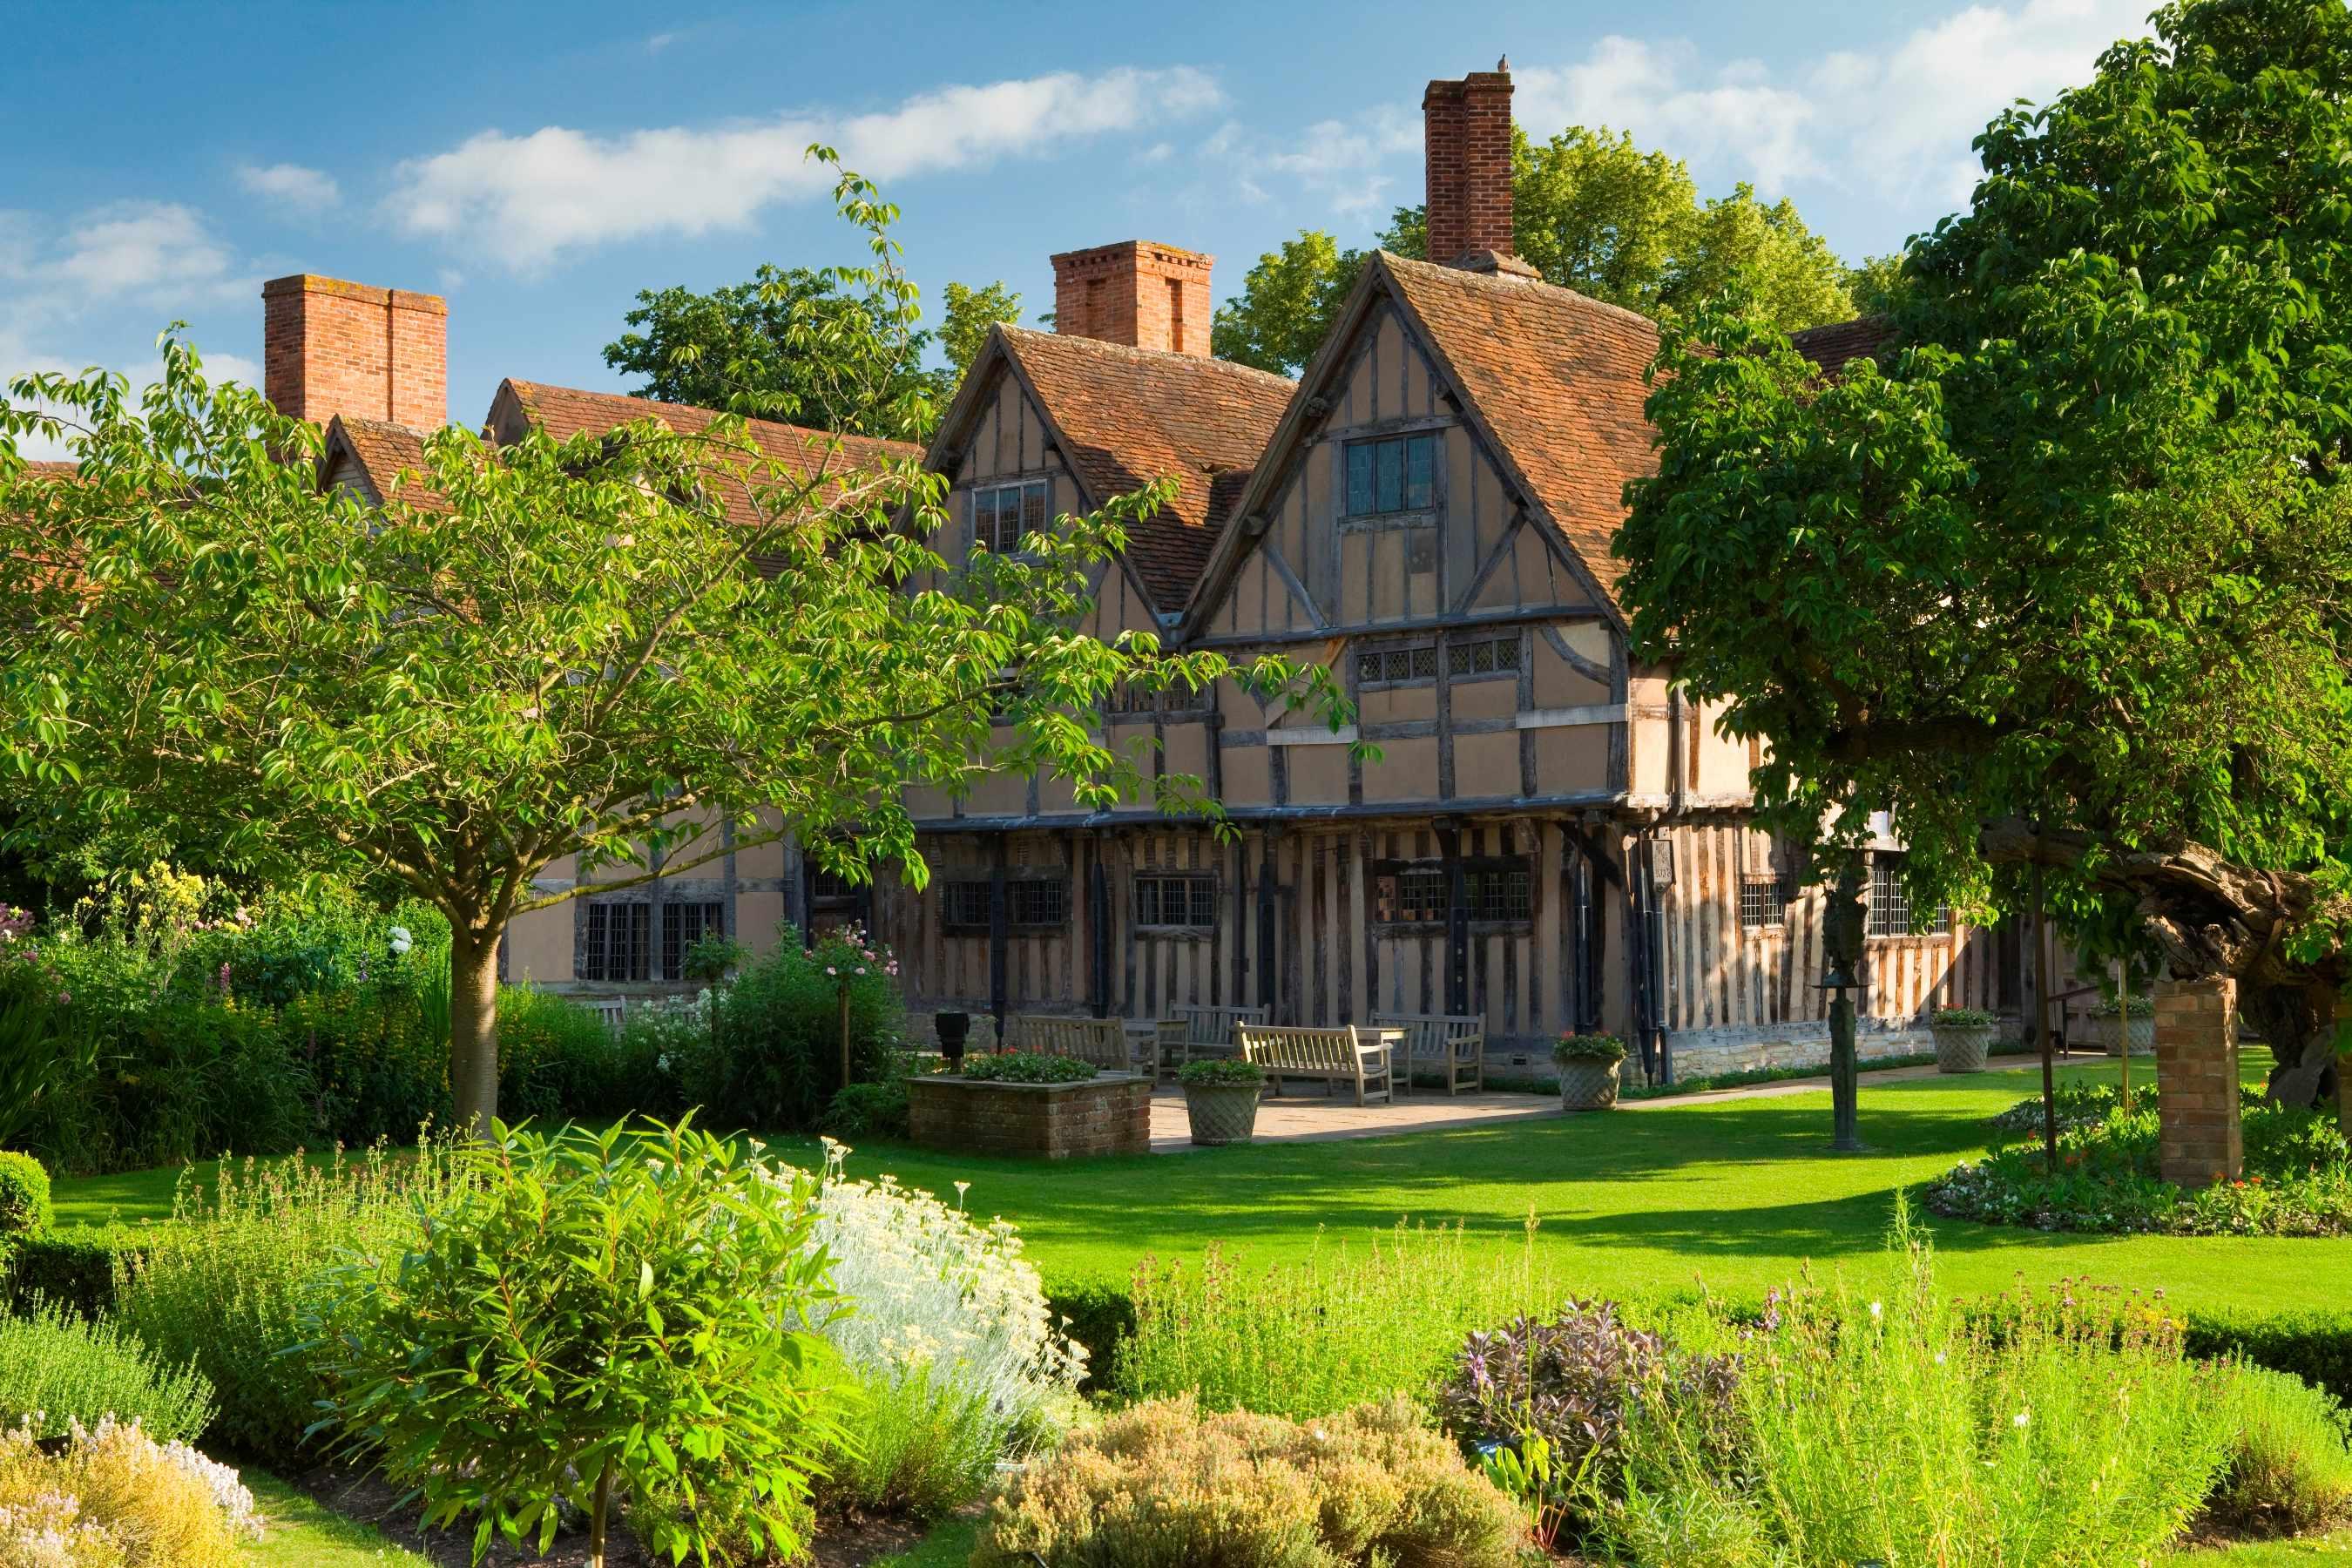 Shakespeare Birthplace Trust - Hall's Croft